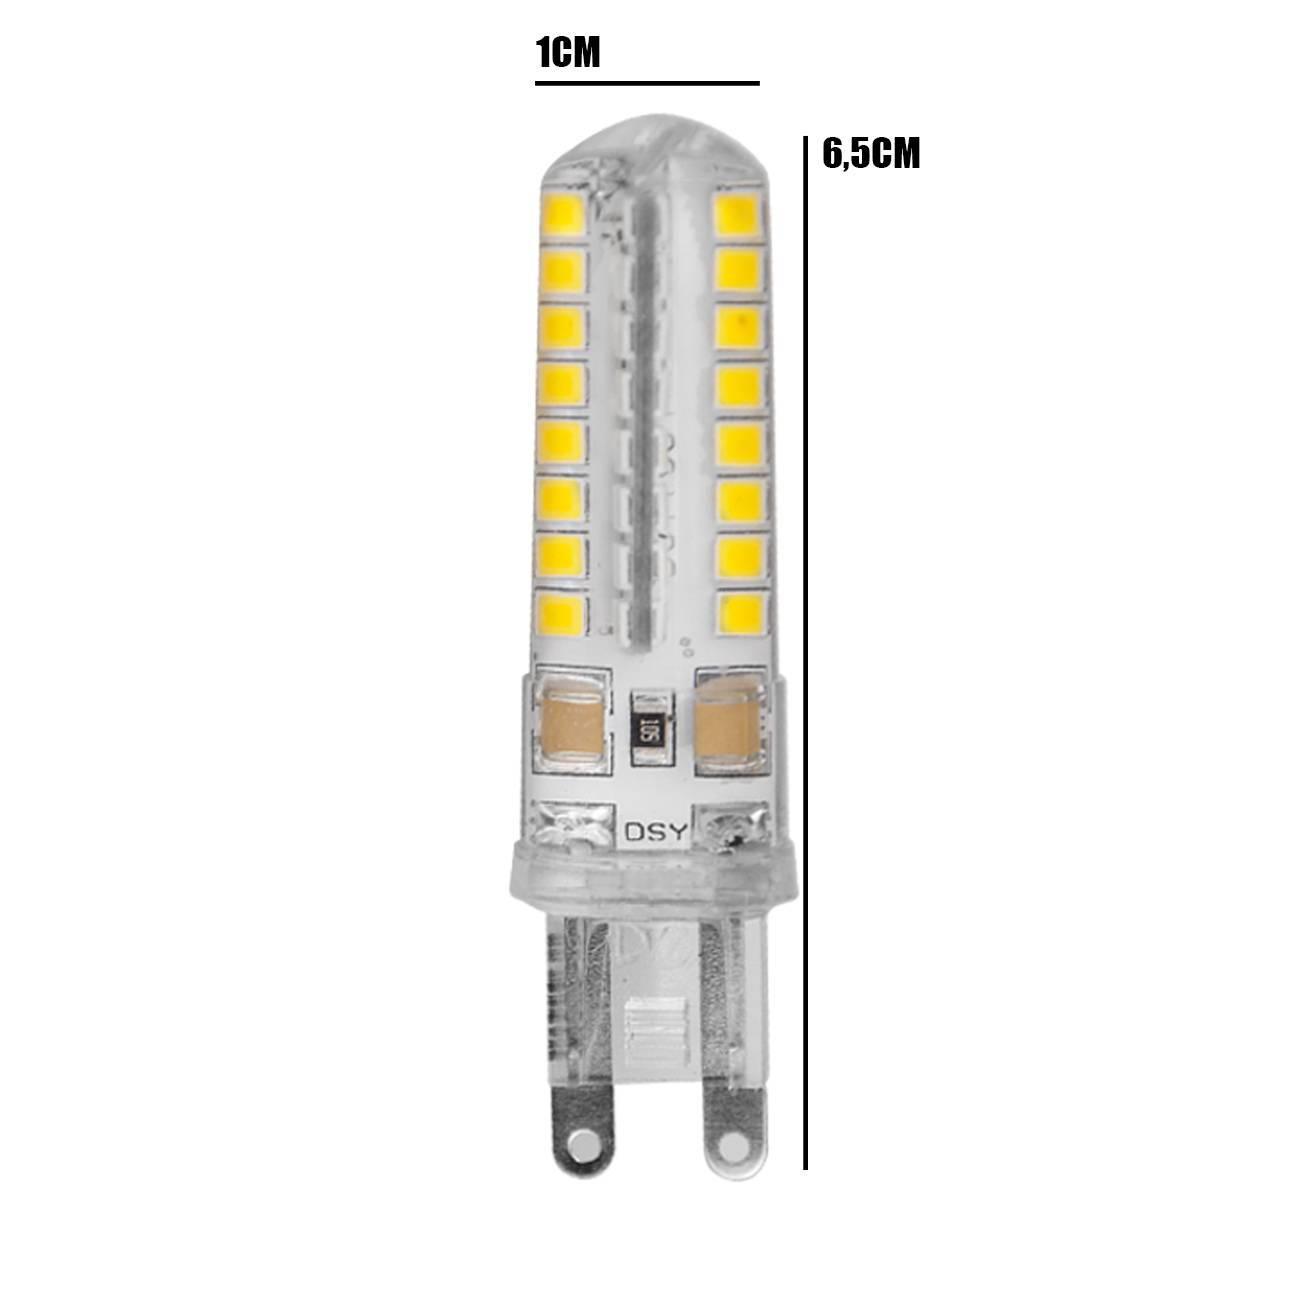 Kit 10 Lâmpadas Led Halopin G9 5w Branco Quente P/ Lustres e - LCGELETRO